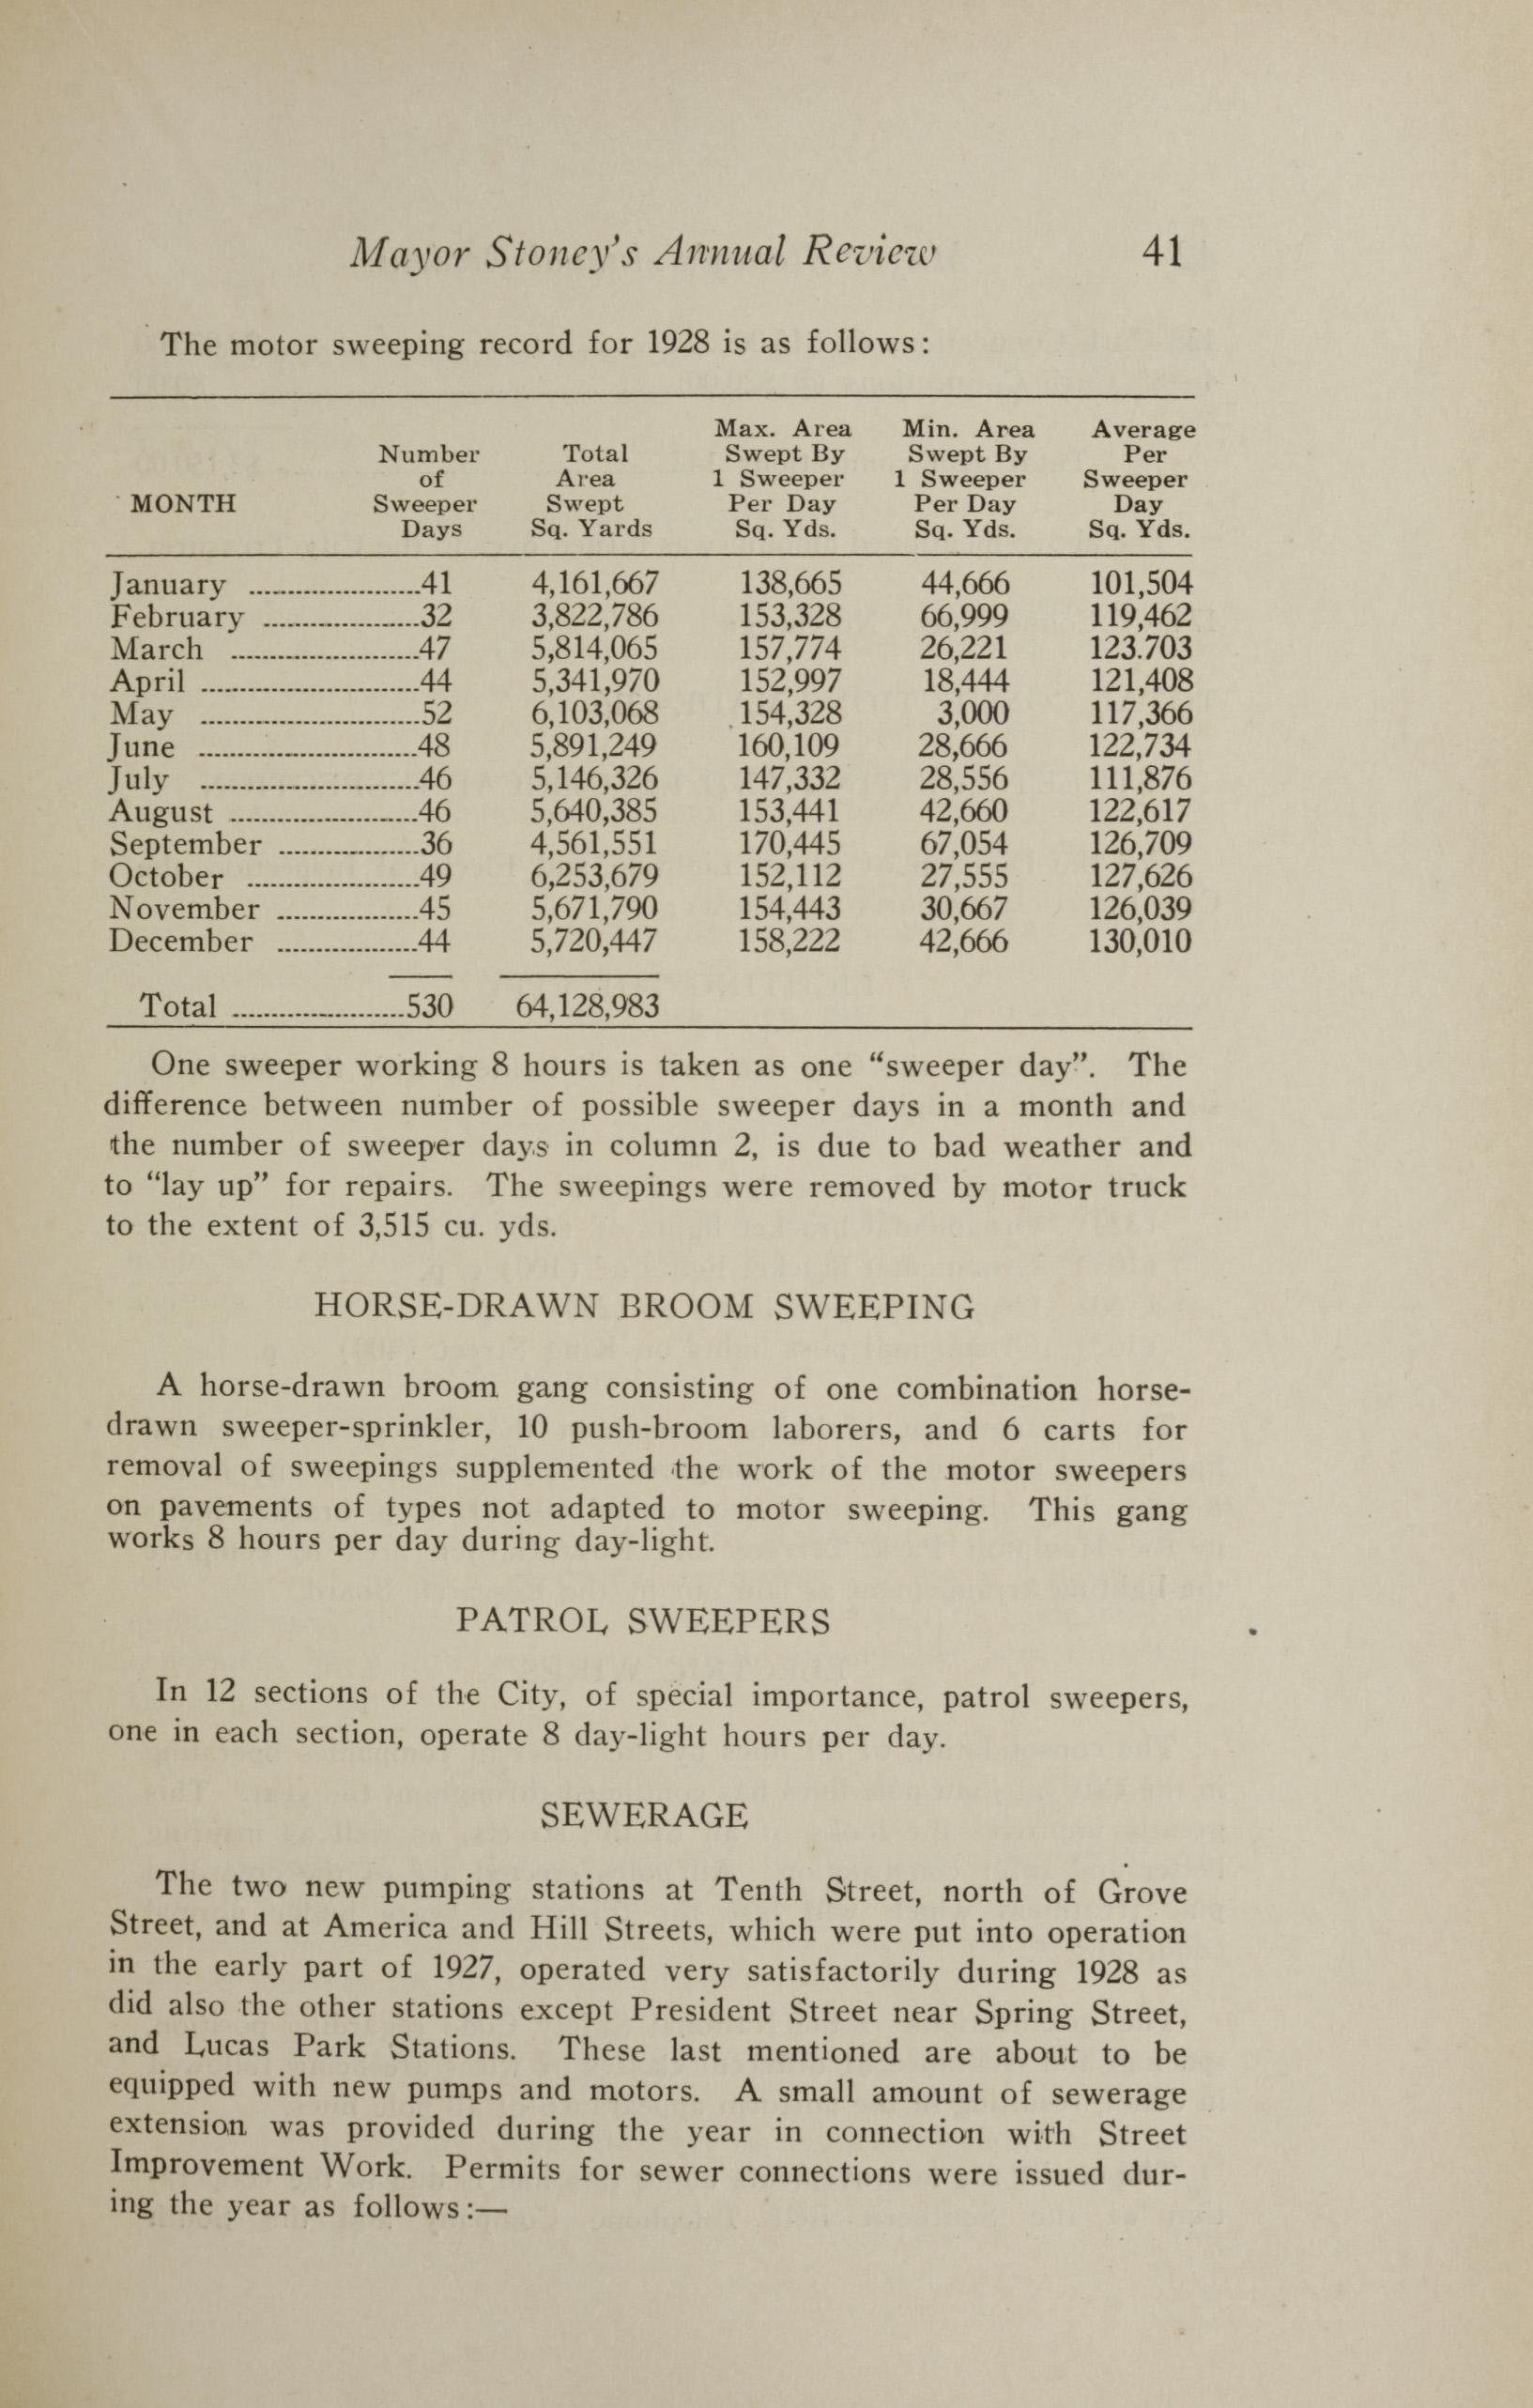 Charleston Yearbook, 1928, page 41